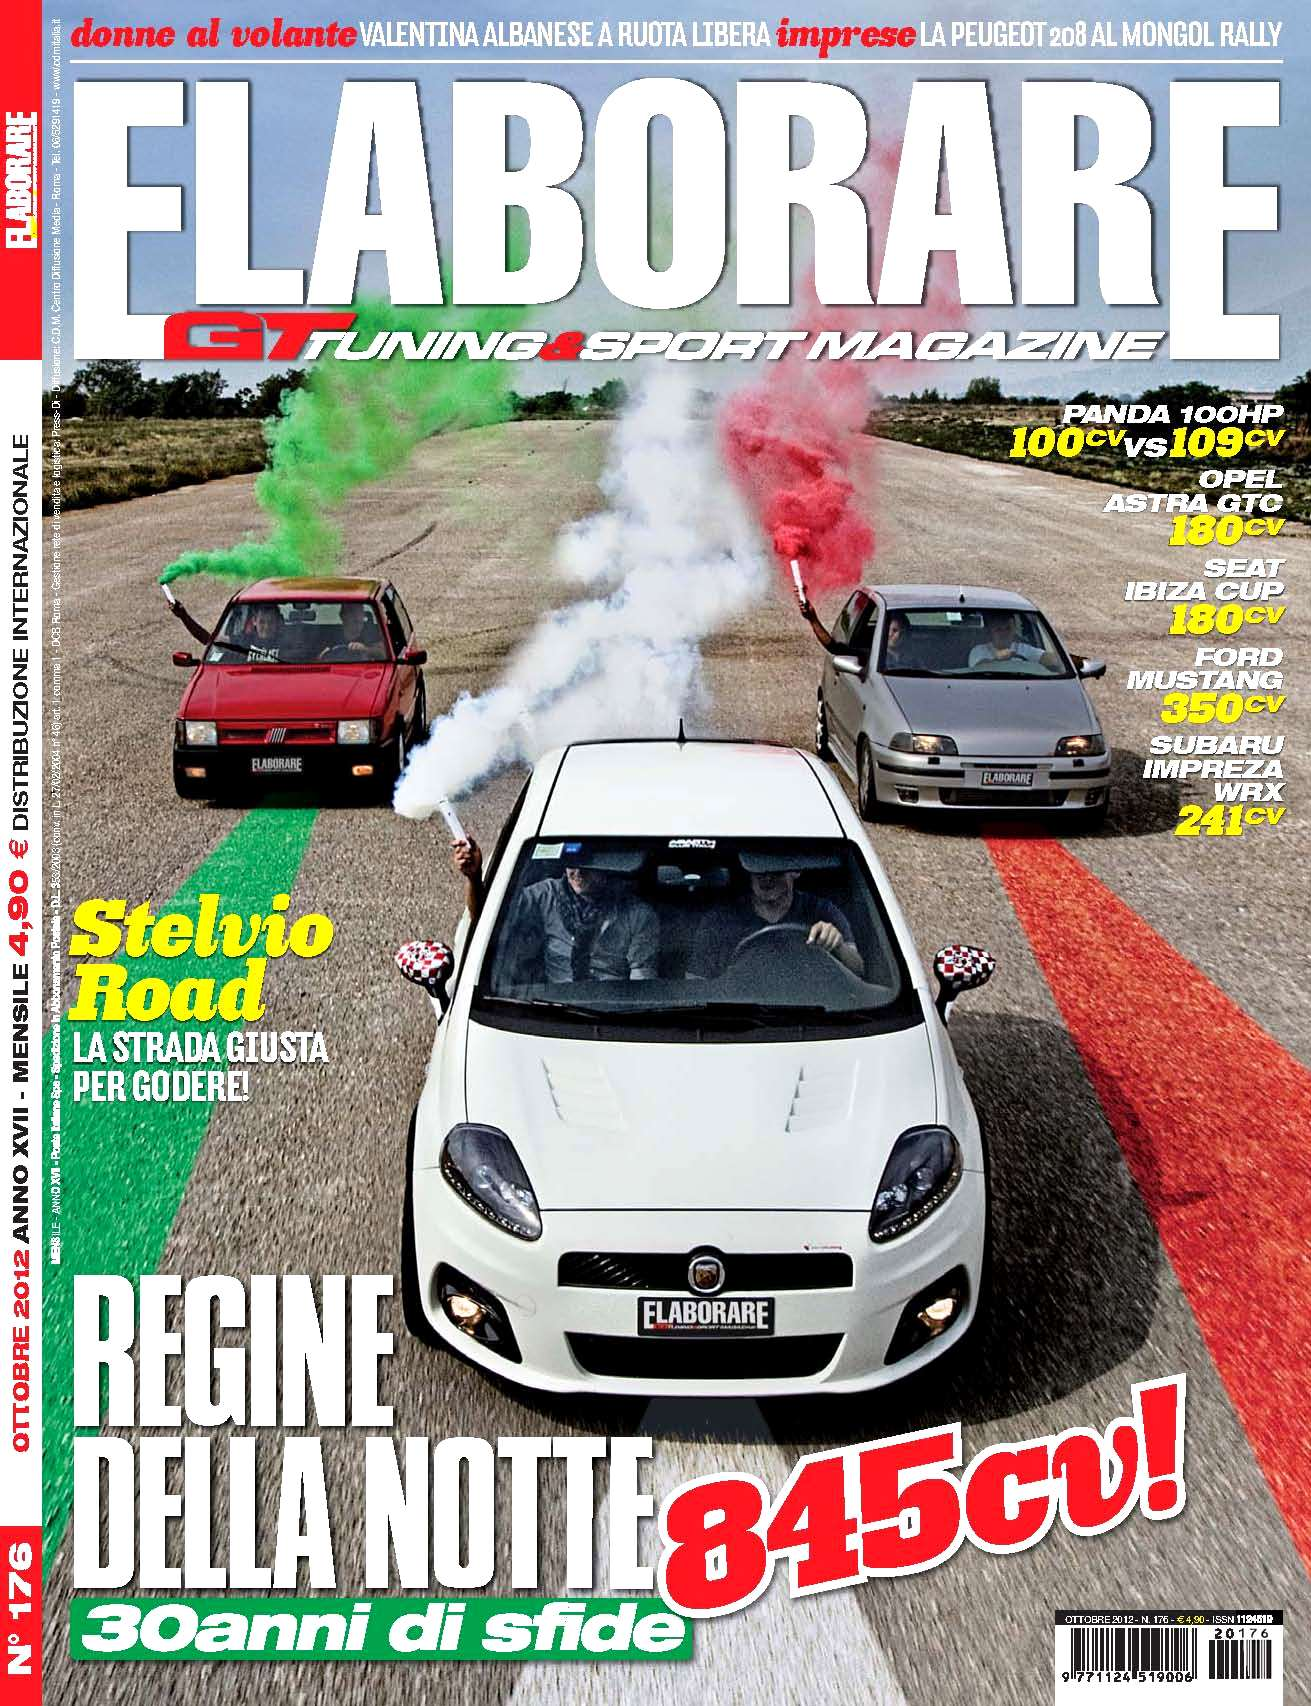 Cover Elaborare 176 ottobre 2012